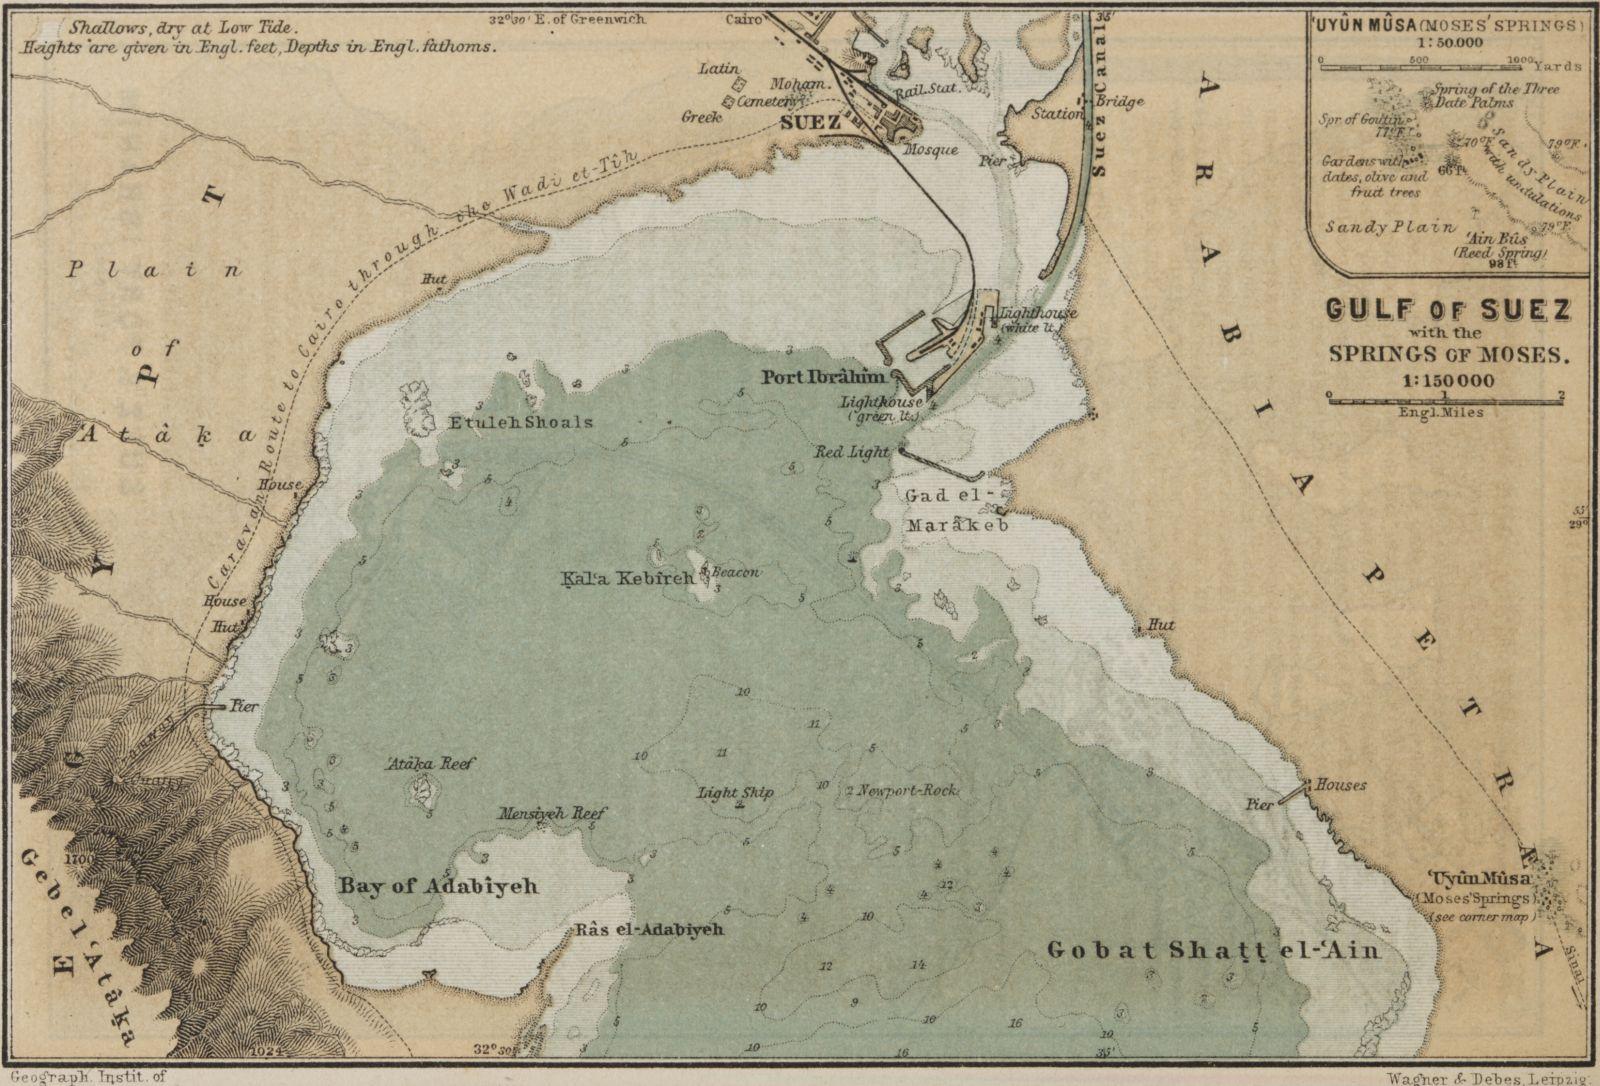 Gulf of Suez